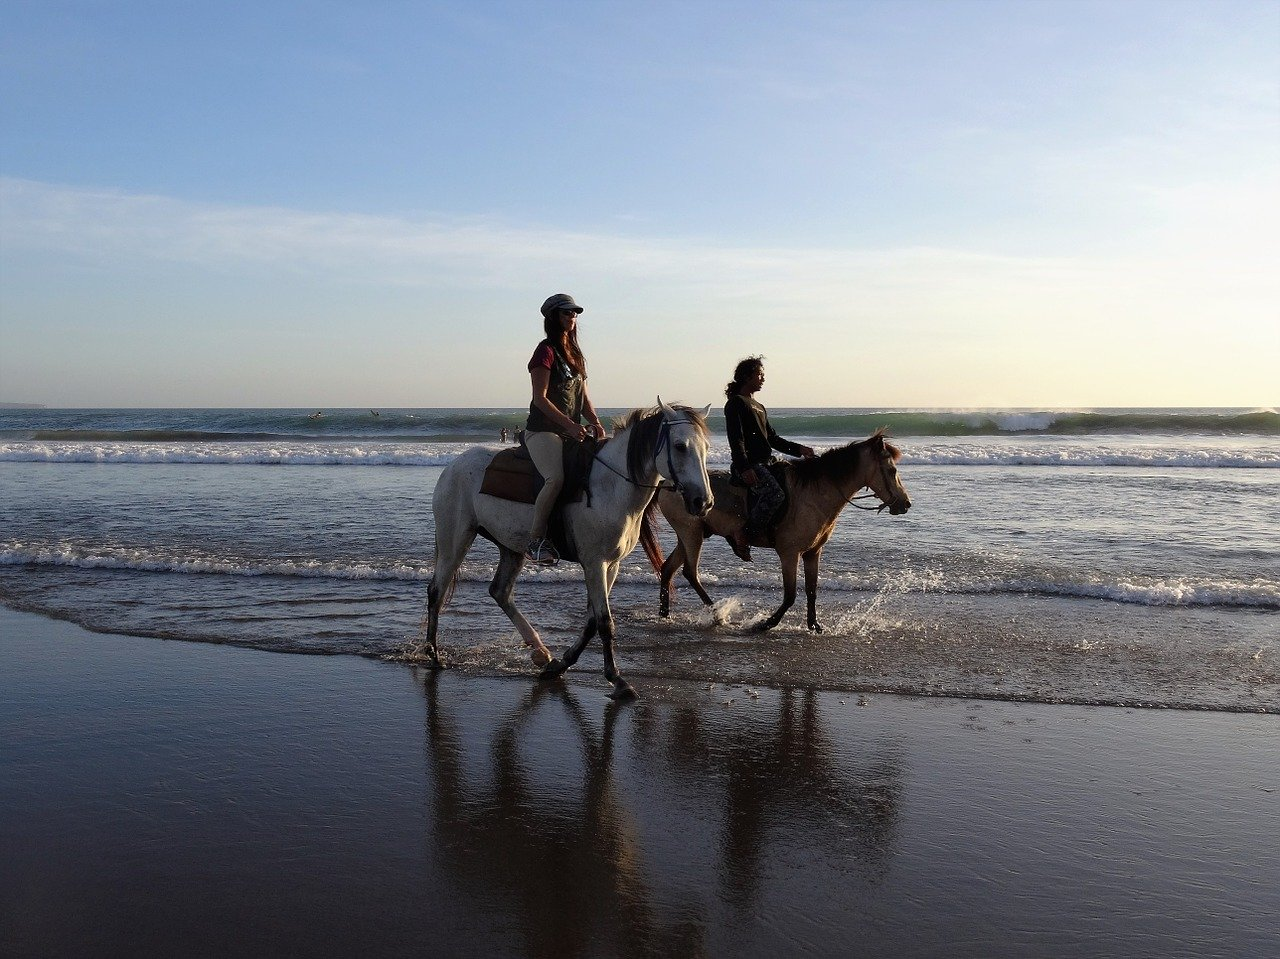 Horses walking on the beach in Bali Indonesia